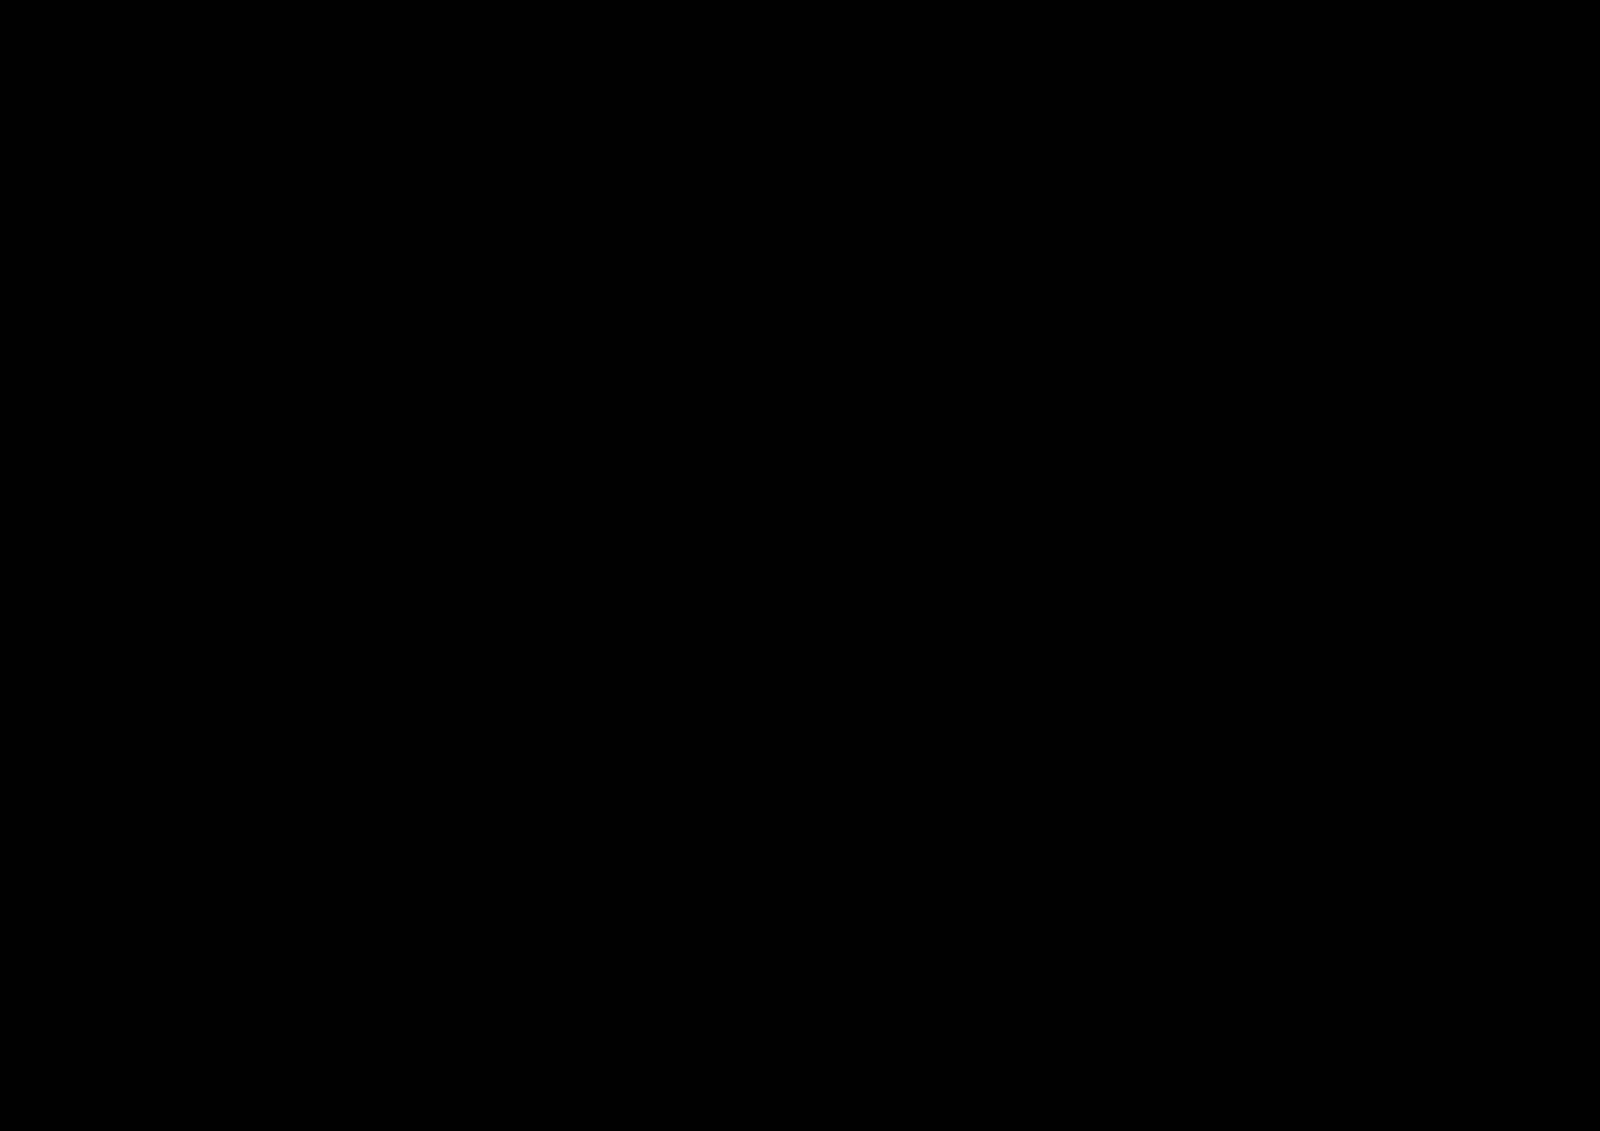 Diegosax Himno Nacional Espanol Partitura Del Himno De Espana Para Flauta Saxofon Alto Clarinete Trompeta Tenor Violin Soprano Sax Viola Violonchelo Corno Ingles Bombardino Tuba Oboe Trompa Y Fagot National Anthem Of